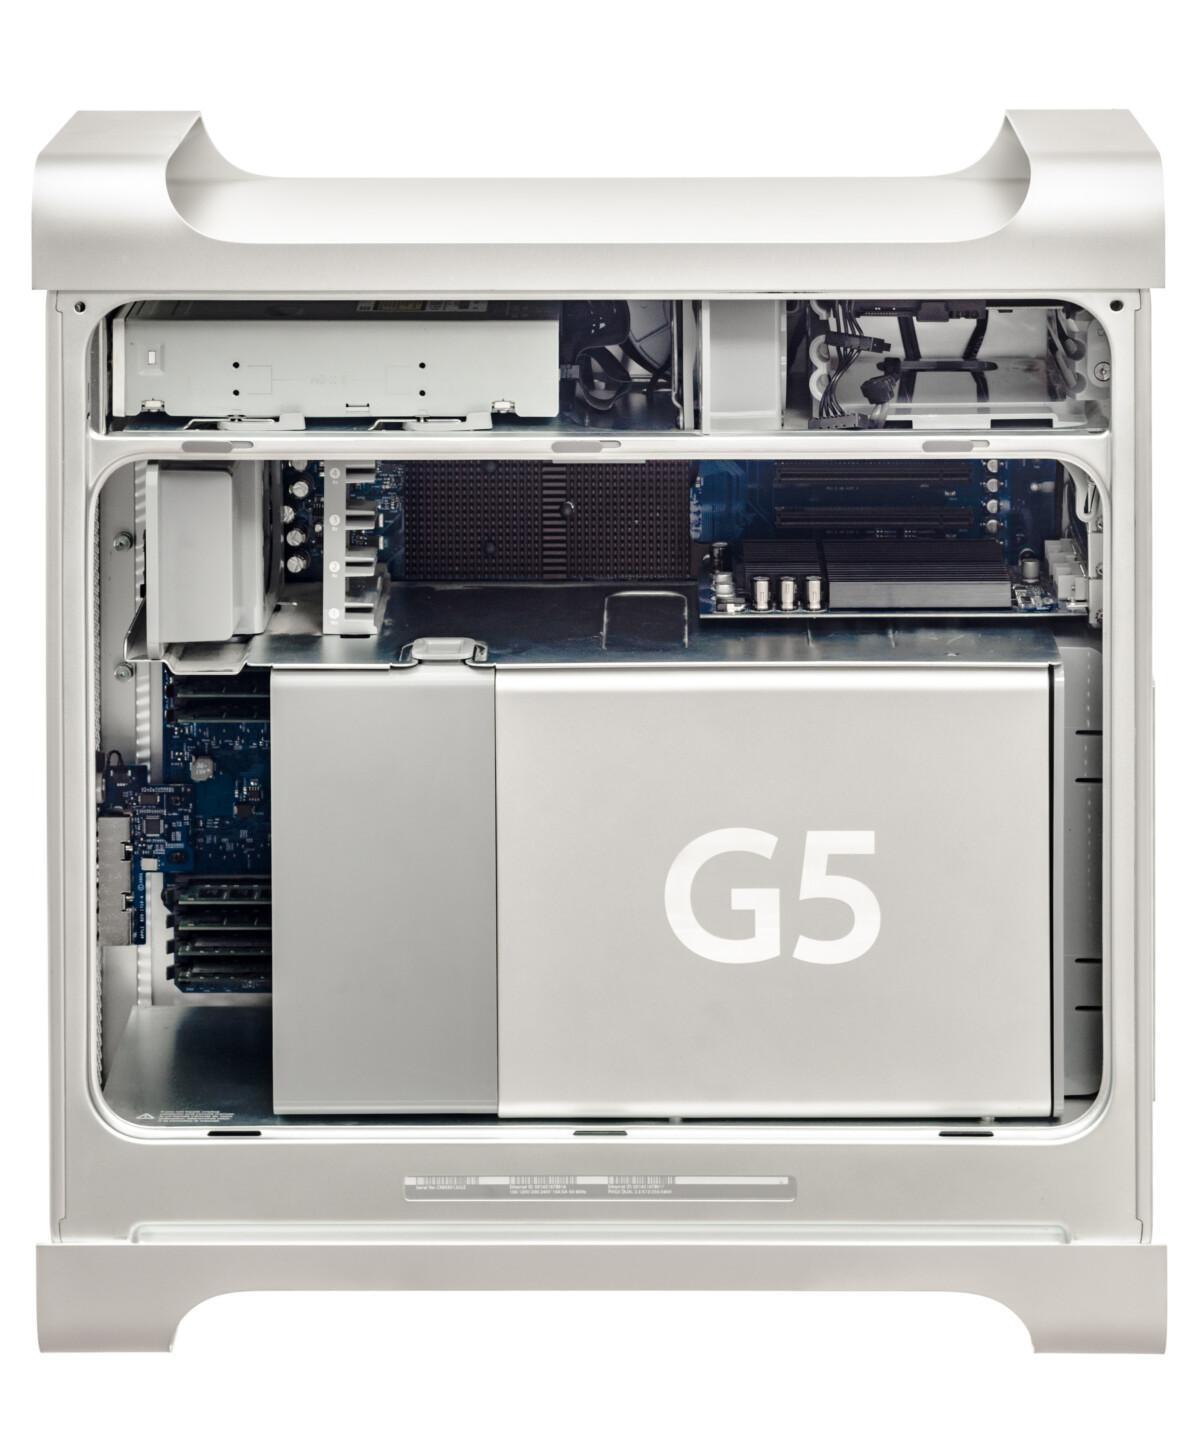 Power Mac G5, last use of PowerPC at Apple